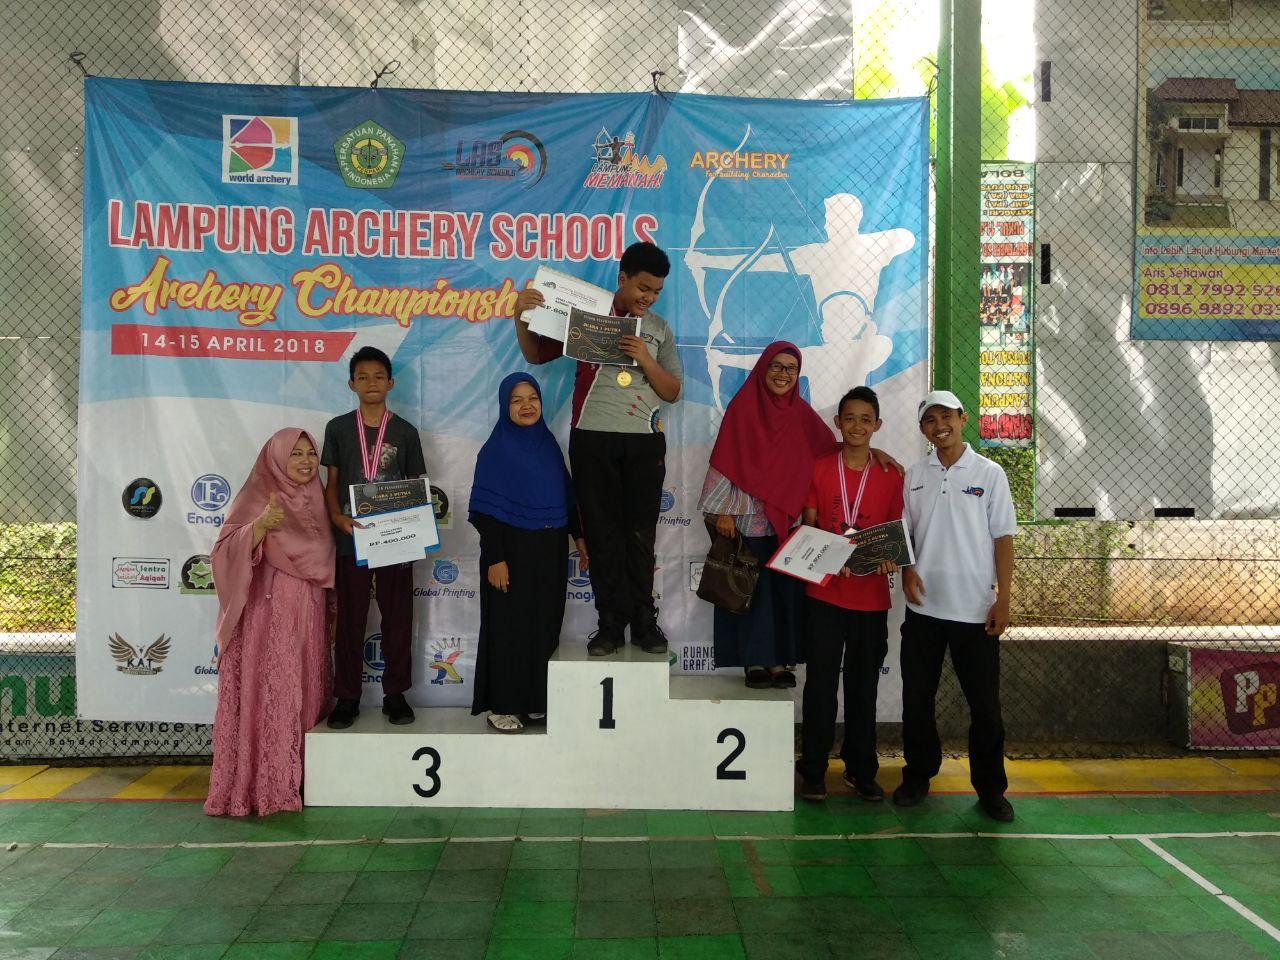 126 Peserta Ikuti Turnamen Panahan Lampung Archery Schools